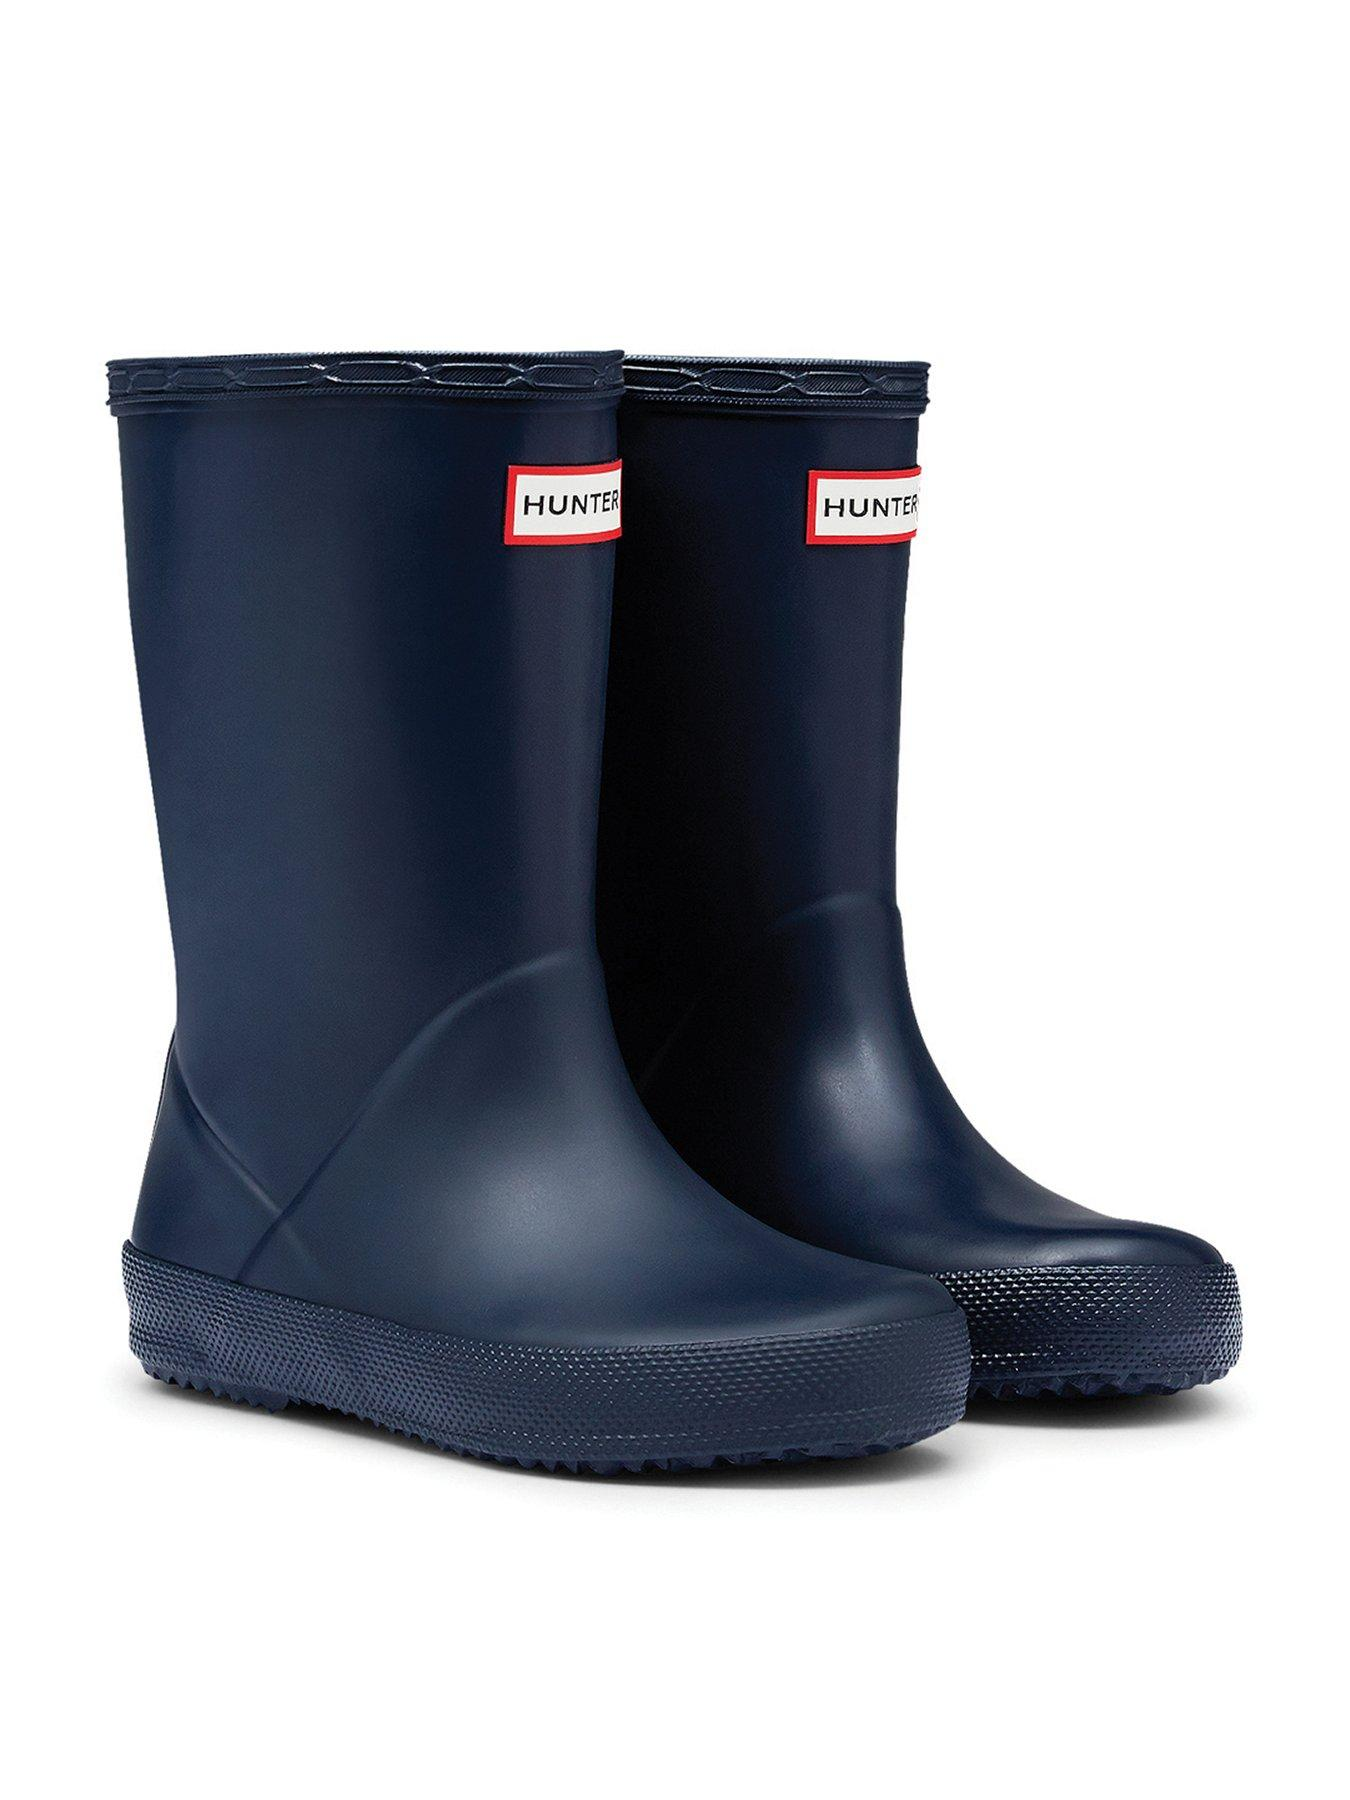 New Childrens//Unisex Navy Rubber Long Leg Wellington Boots UK Size